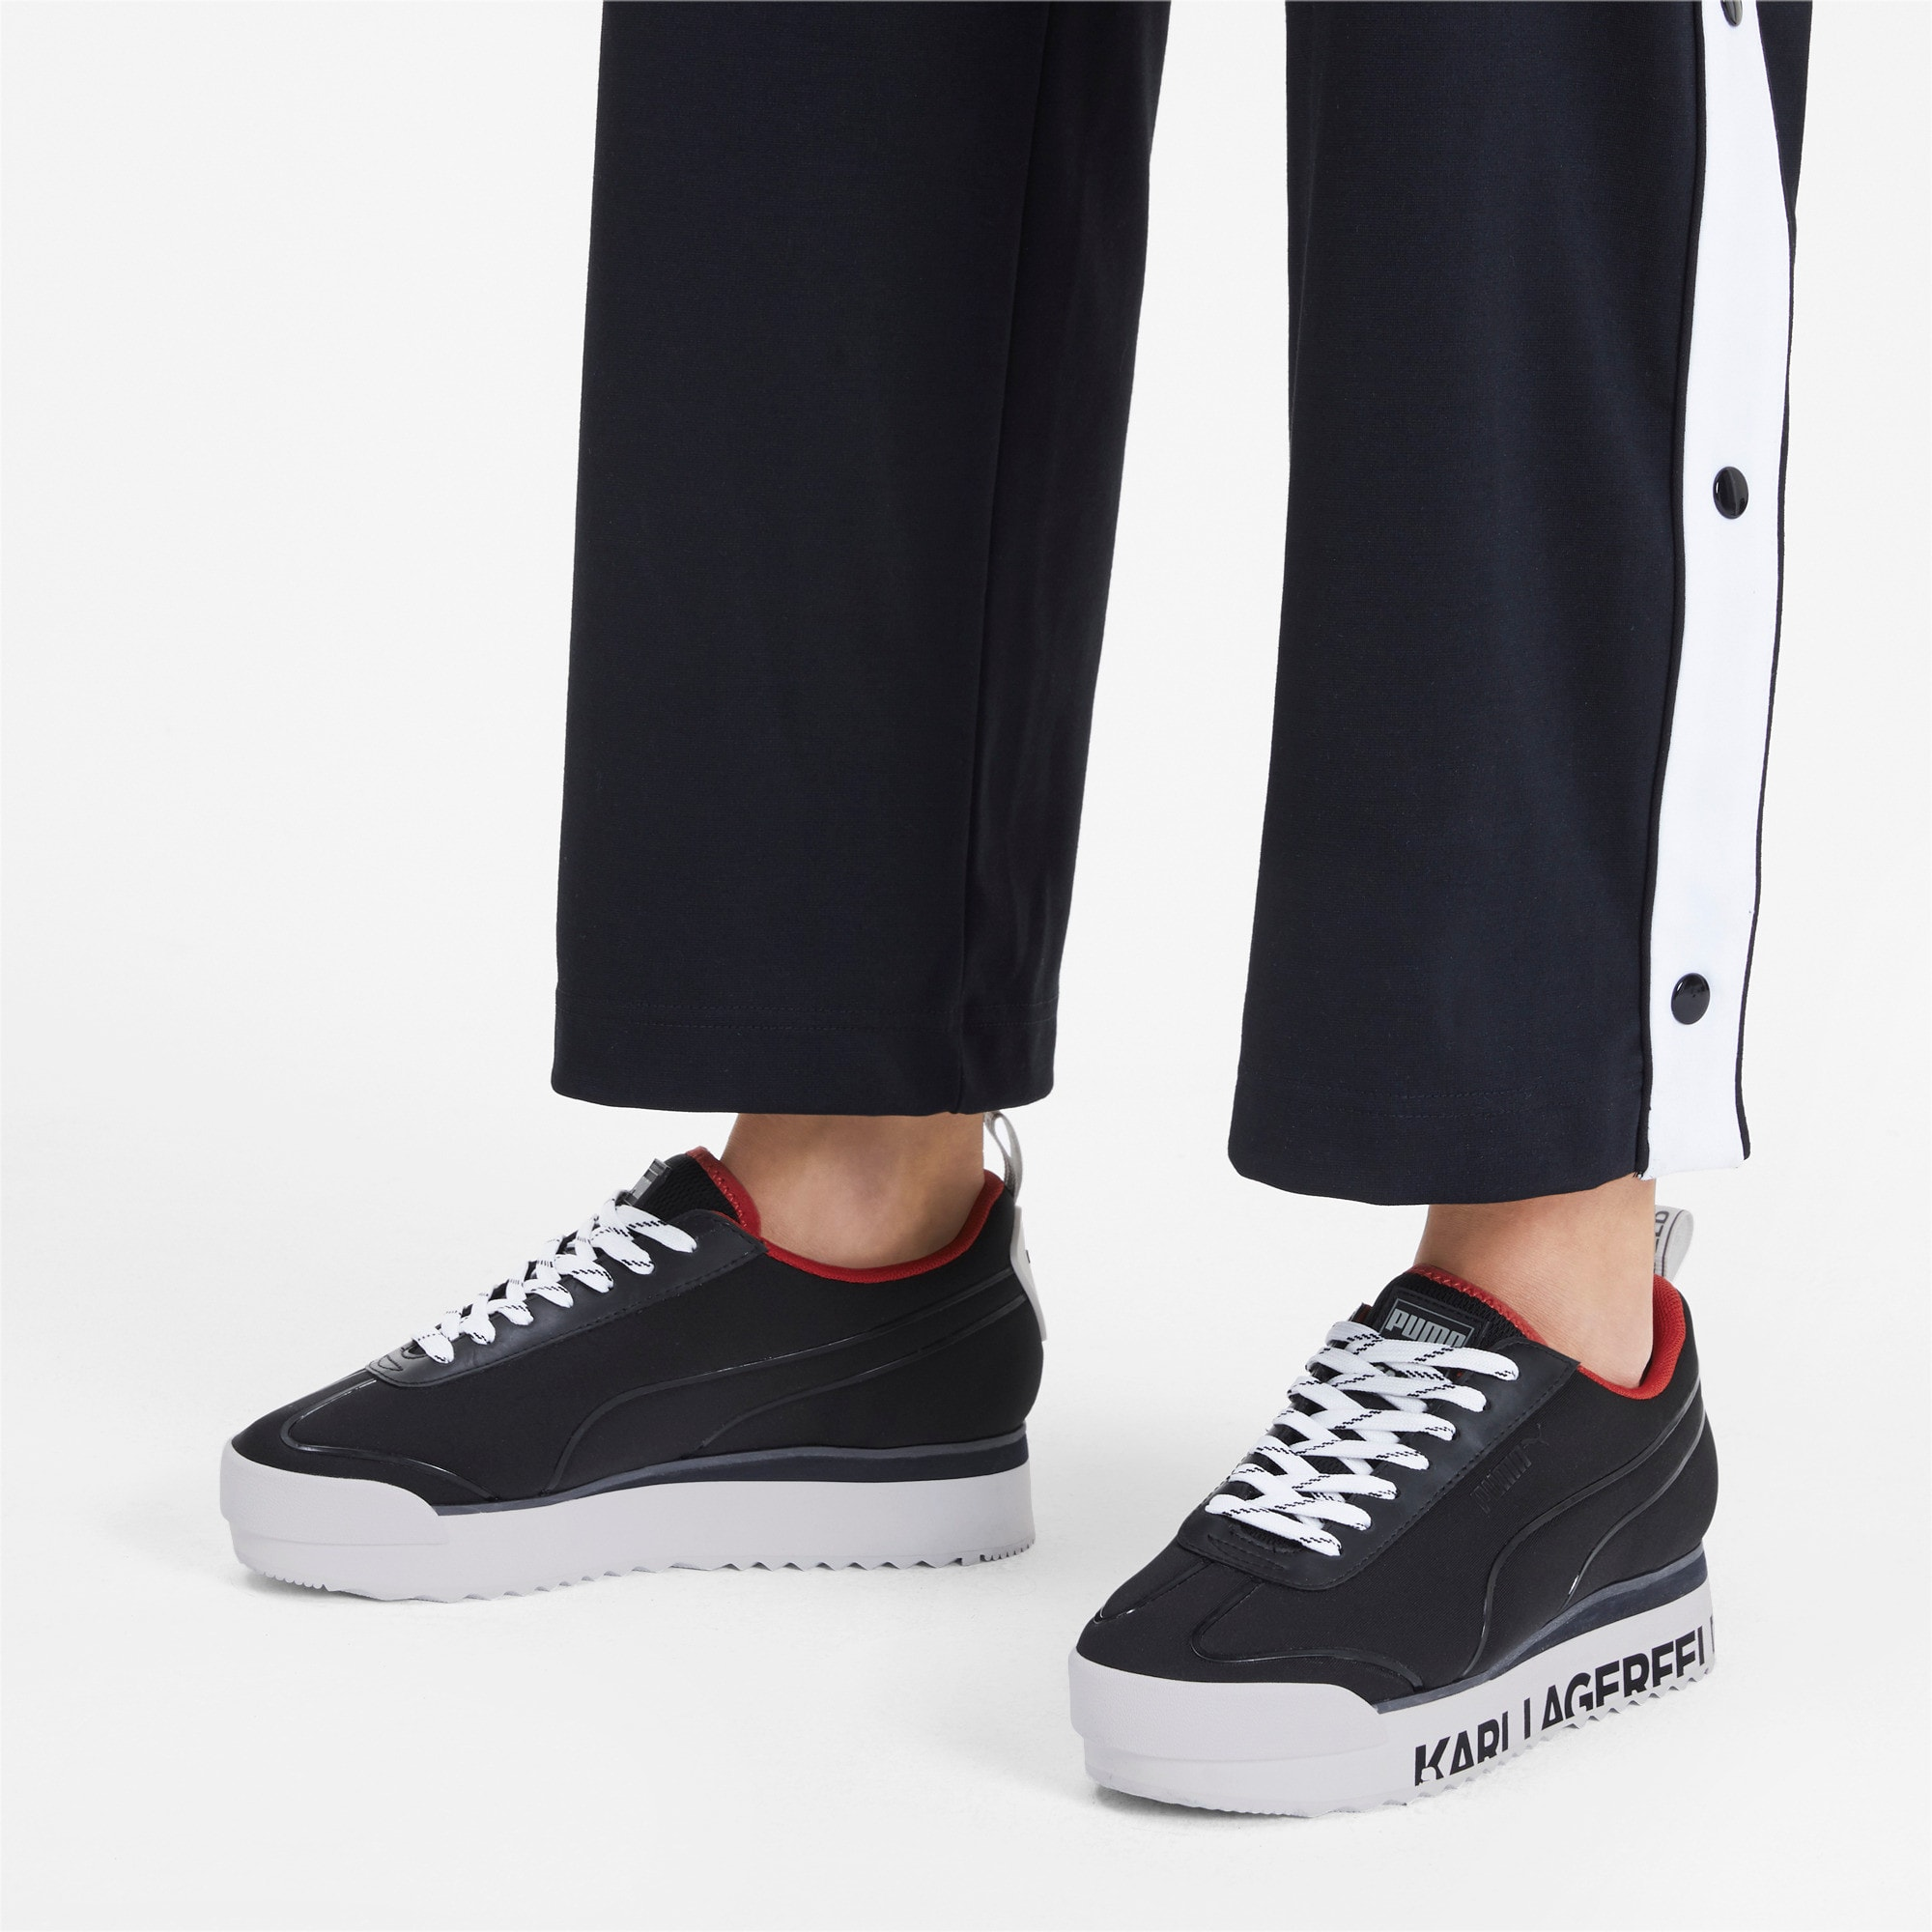 Thumbnail 2 of PUMA x KARL LAGERFELD Roma Amor Women's Sneakers, Puma Black-Puma Black, medium